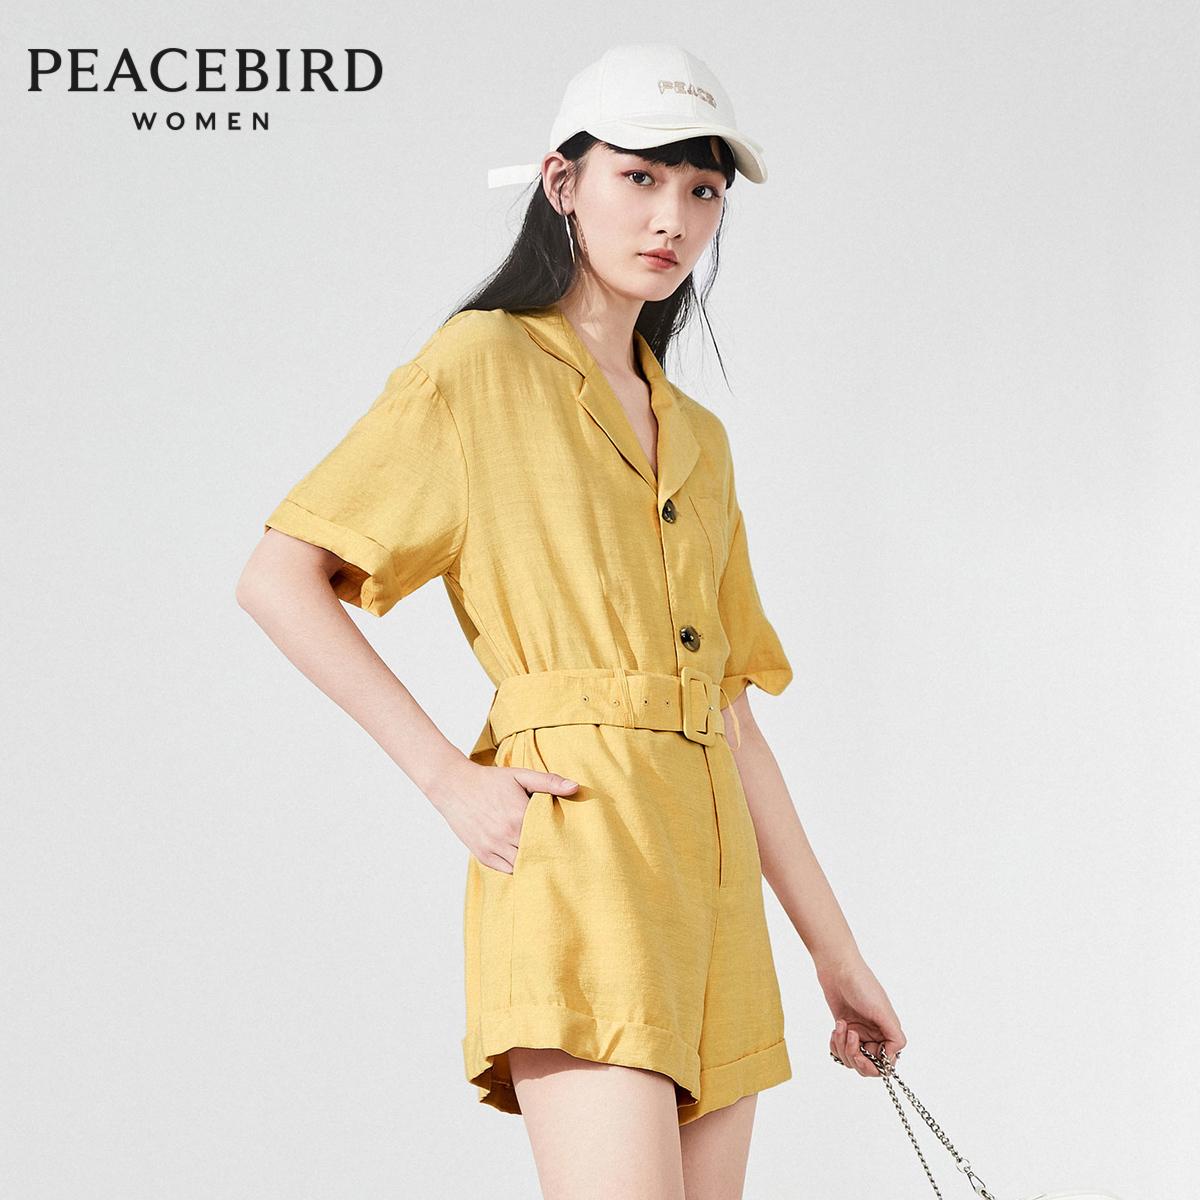 Taipingniao summer short sleeve one-piece shorts womens 20 New Khaki yellow lace up Jumpsuit shorts V-neck temperament